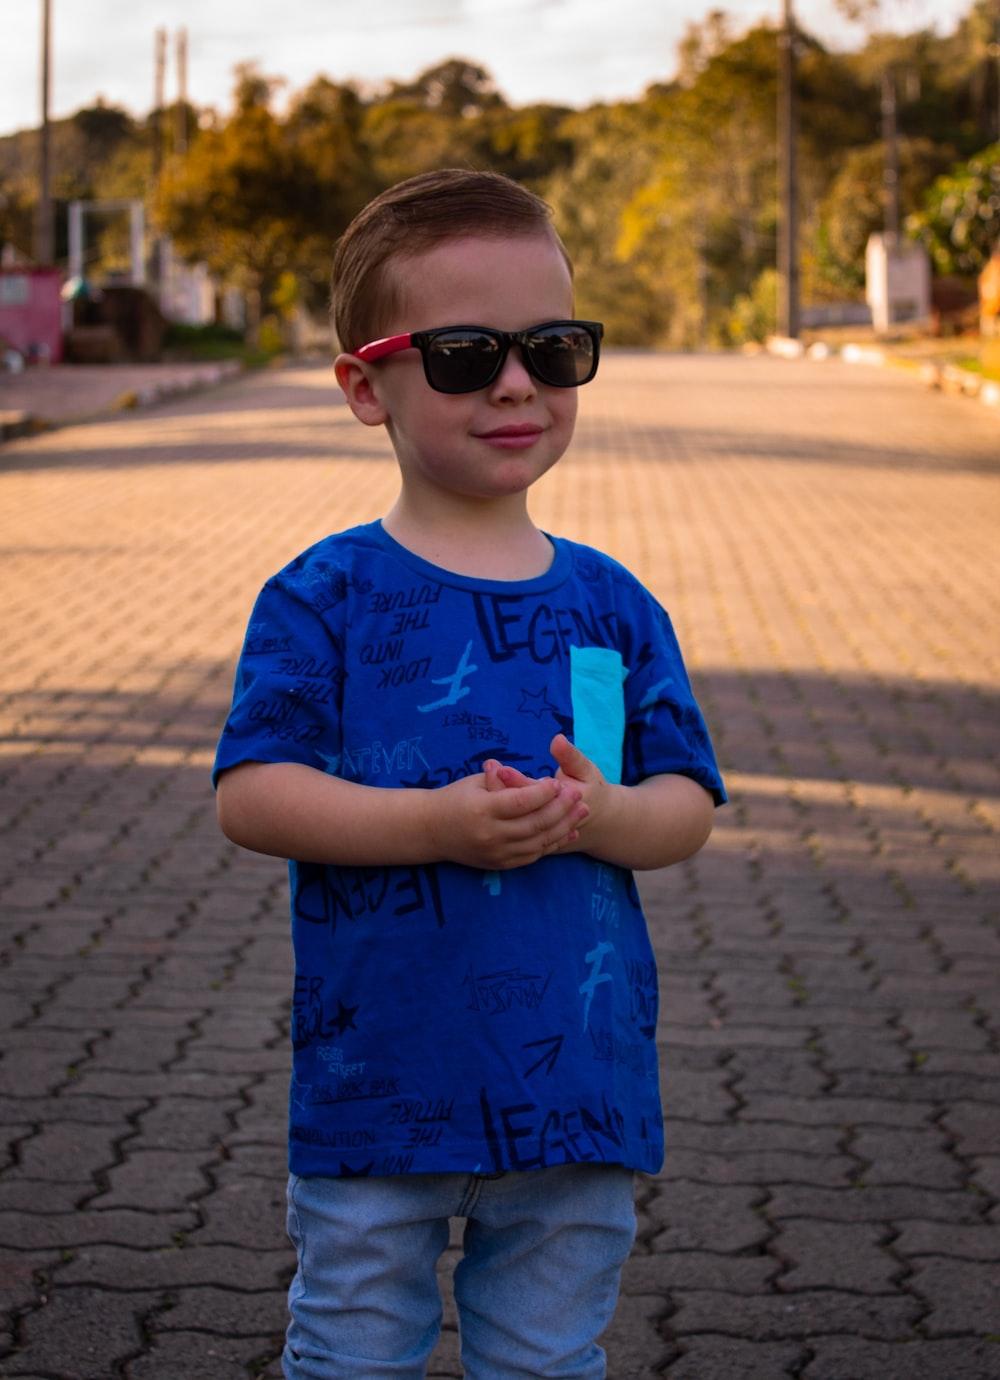 boy in blue crew neck t-shirt wearing brown sunglasses standing on sidewalk during daytime